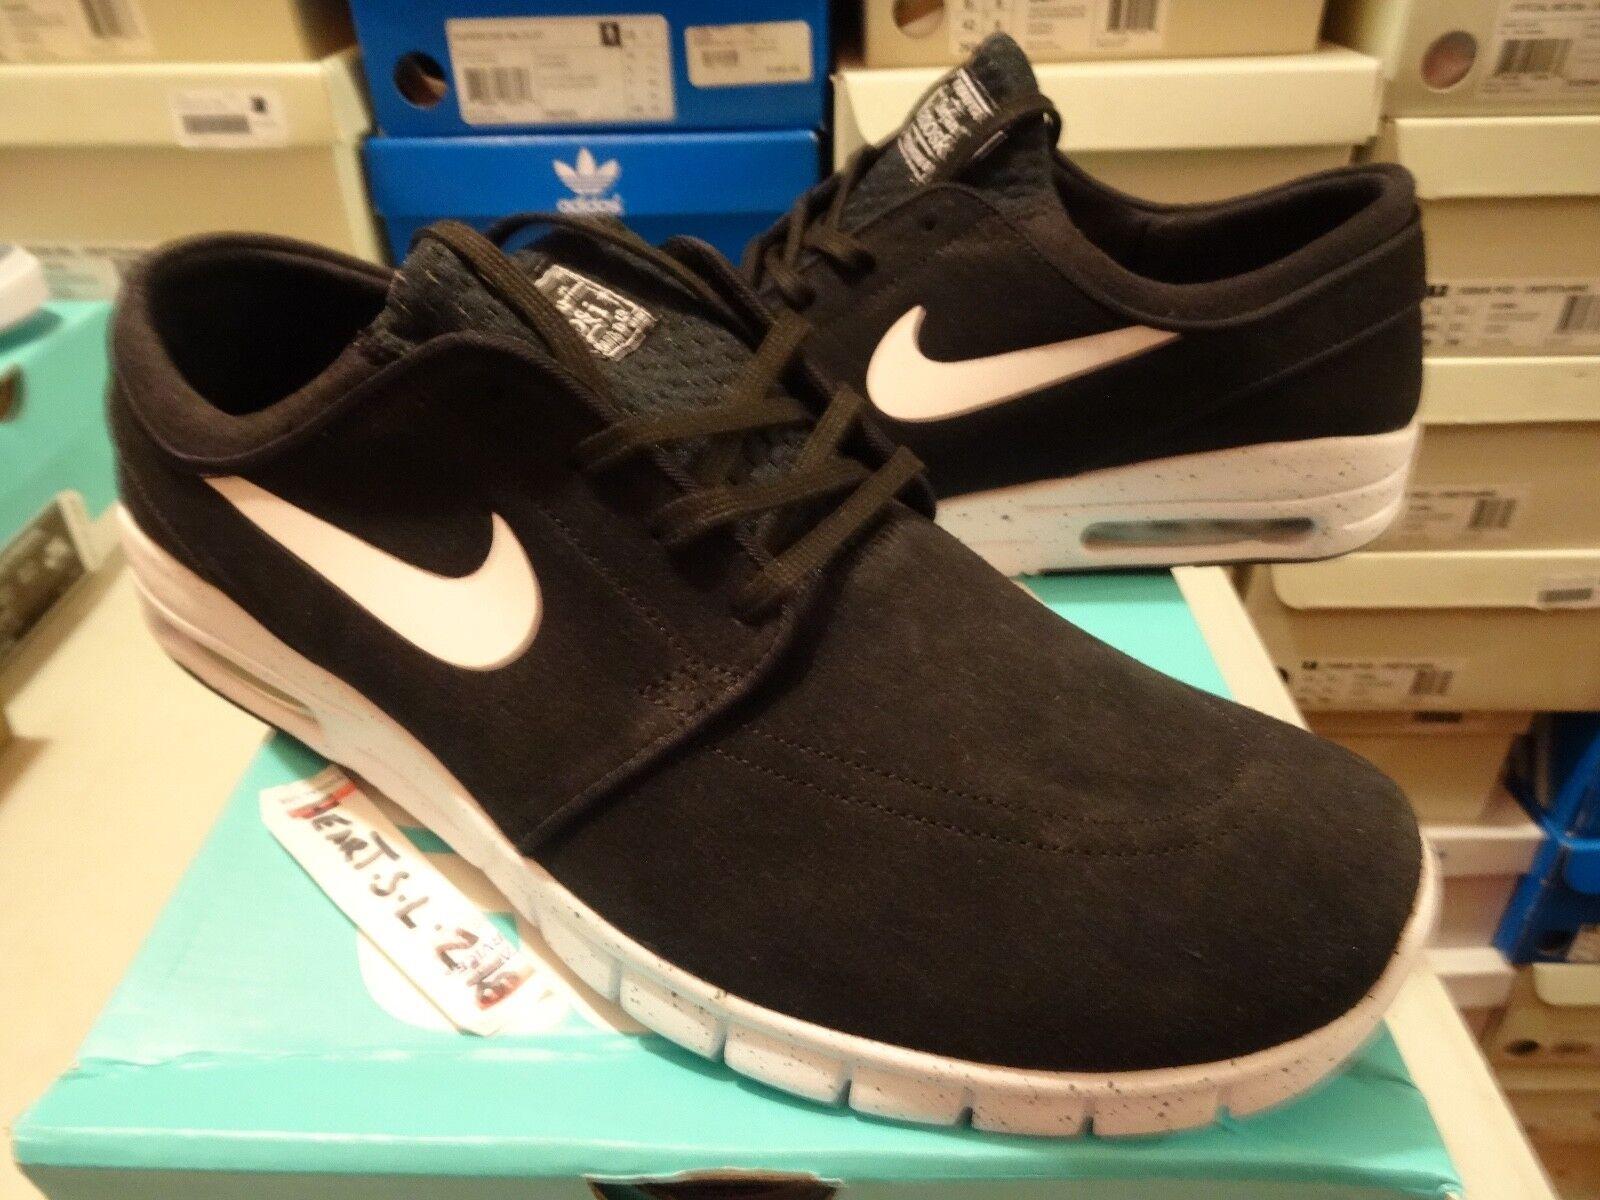 NEW Nike SB Stefan Janoski Max L DUNK 685299 002 Paint Splatter Jordans SZ 13 DS